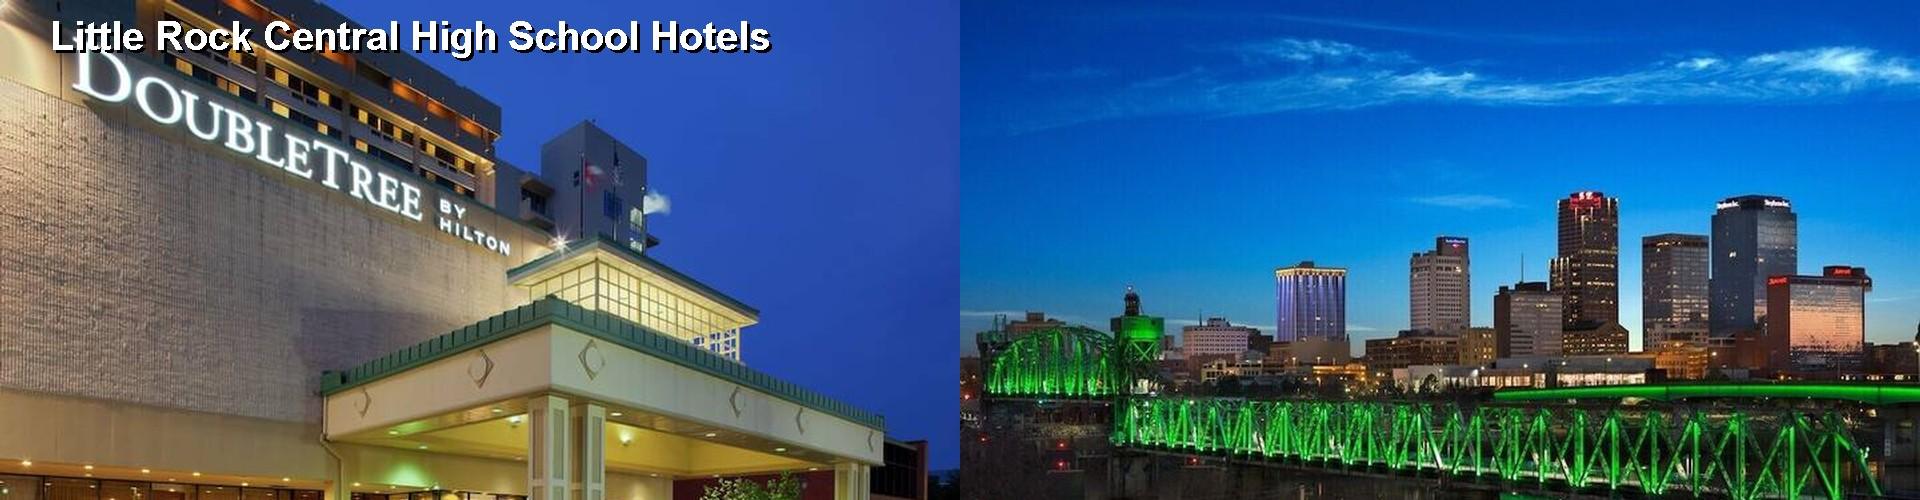 5 Best Hotels Near Little Rock Central High School